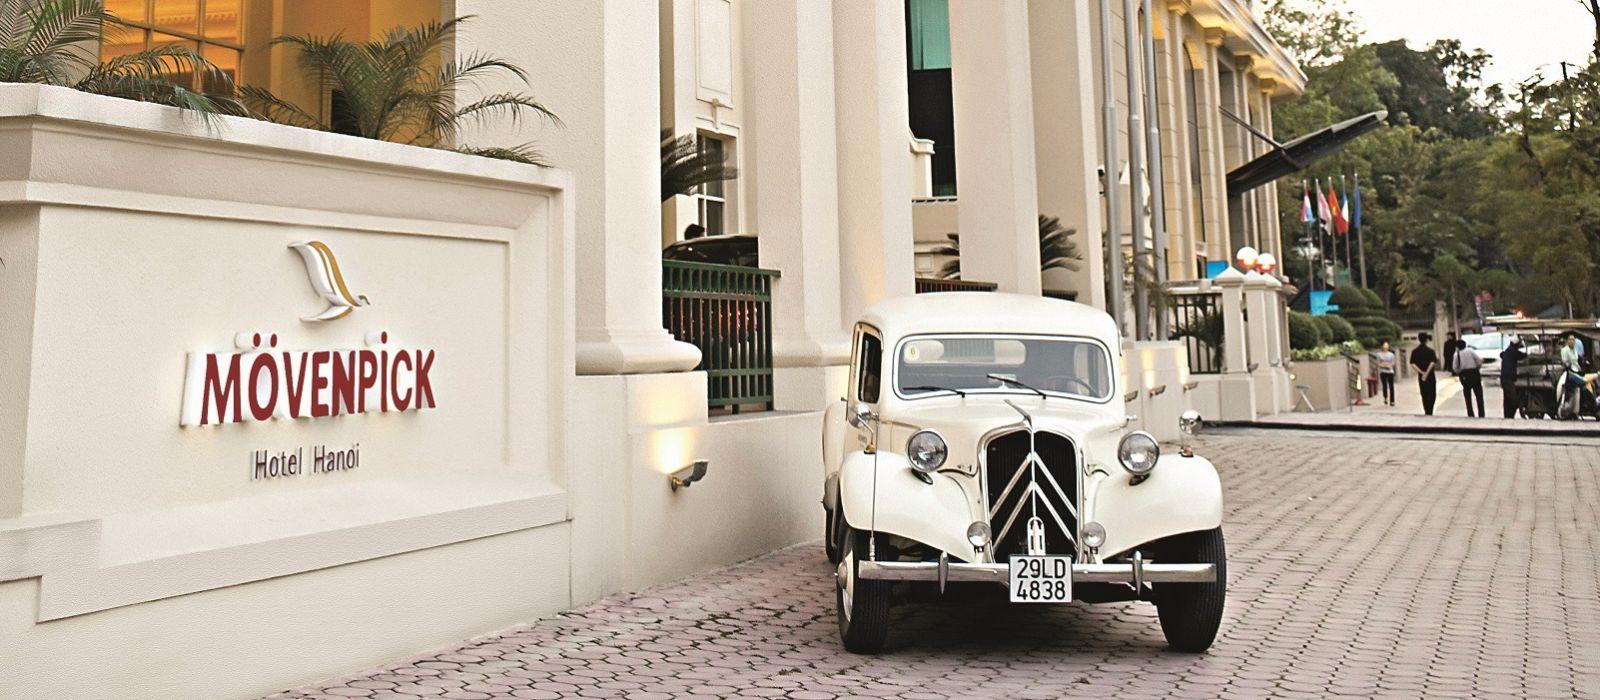 Hotel Mövenpick  Hanoi Vietnam